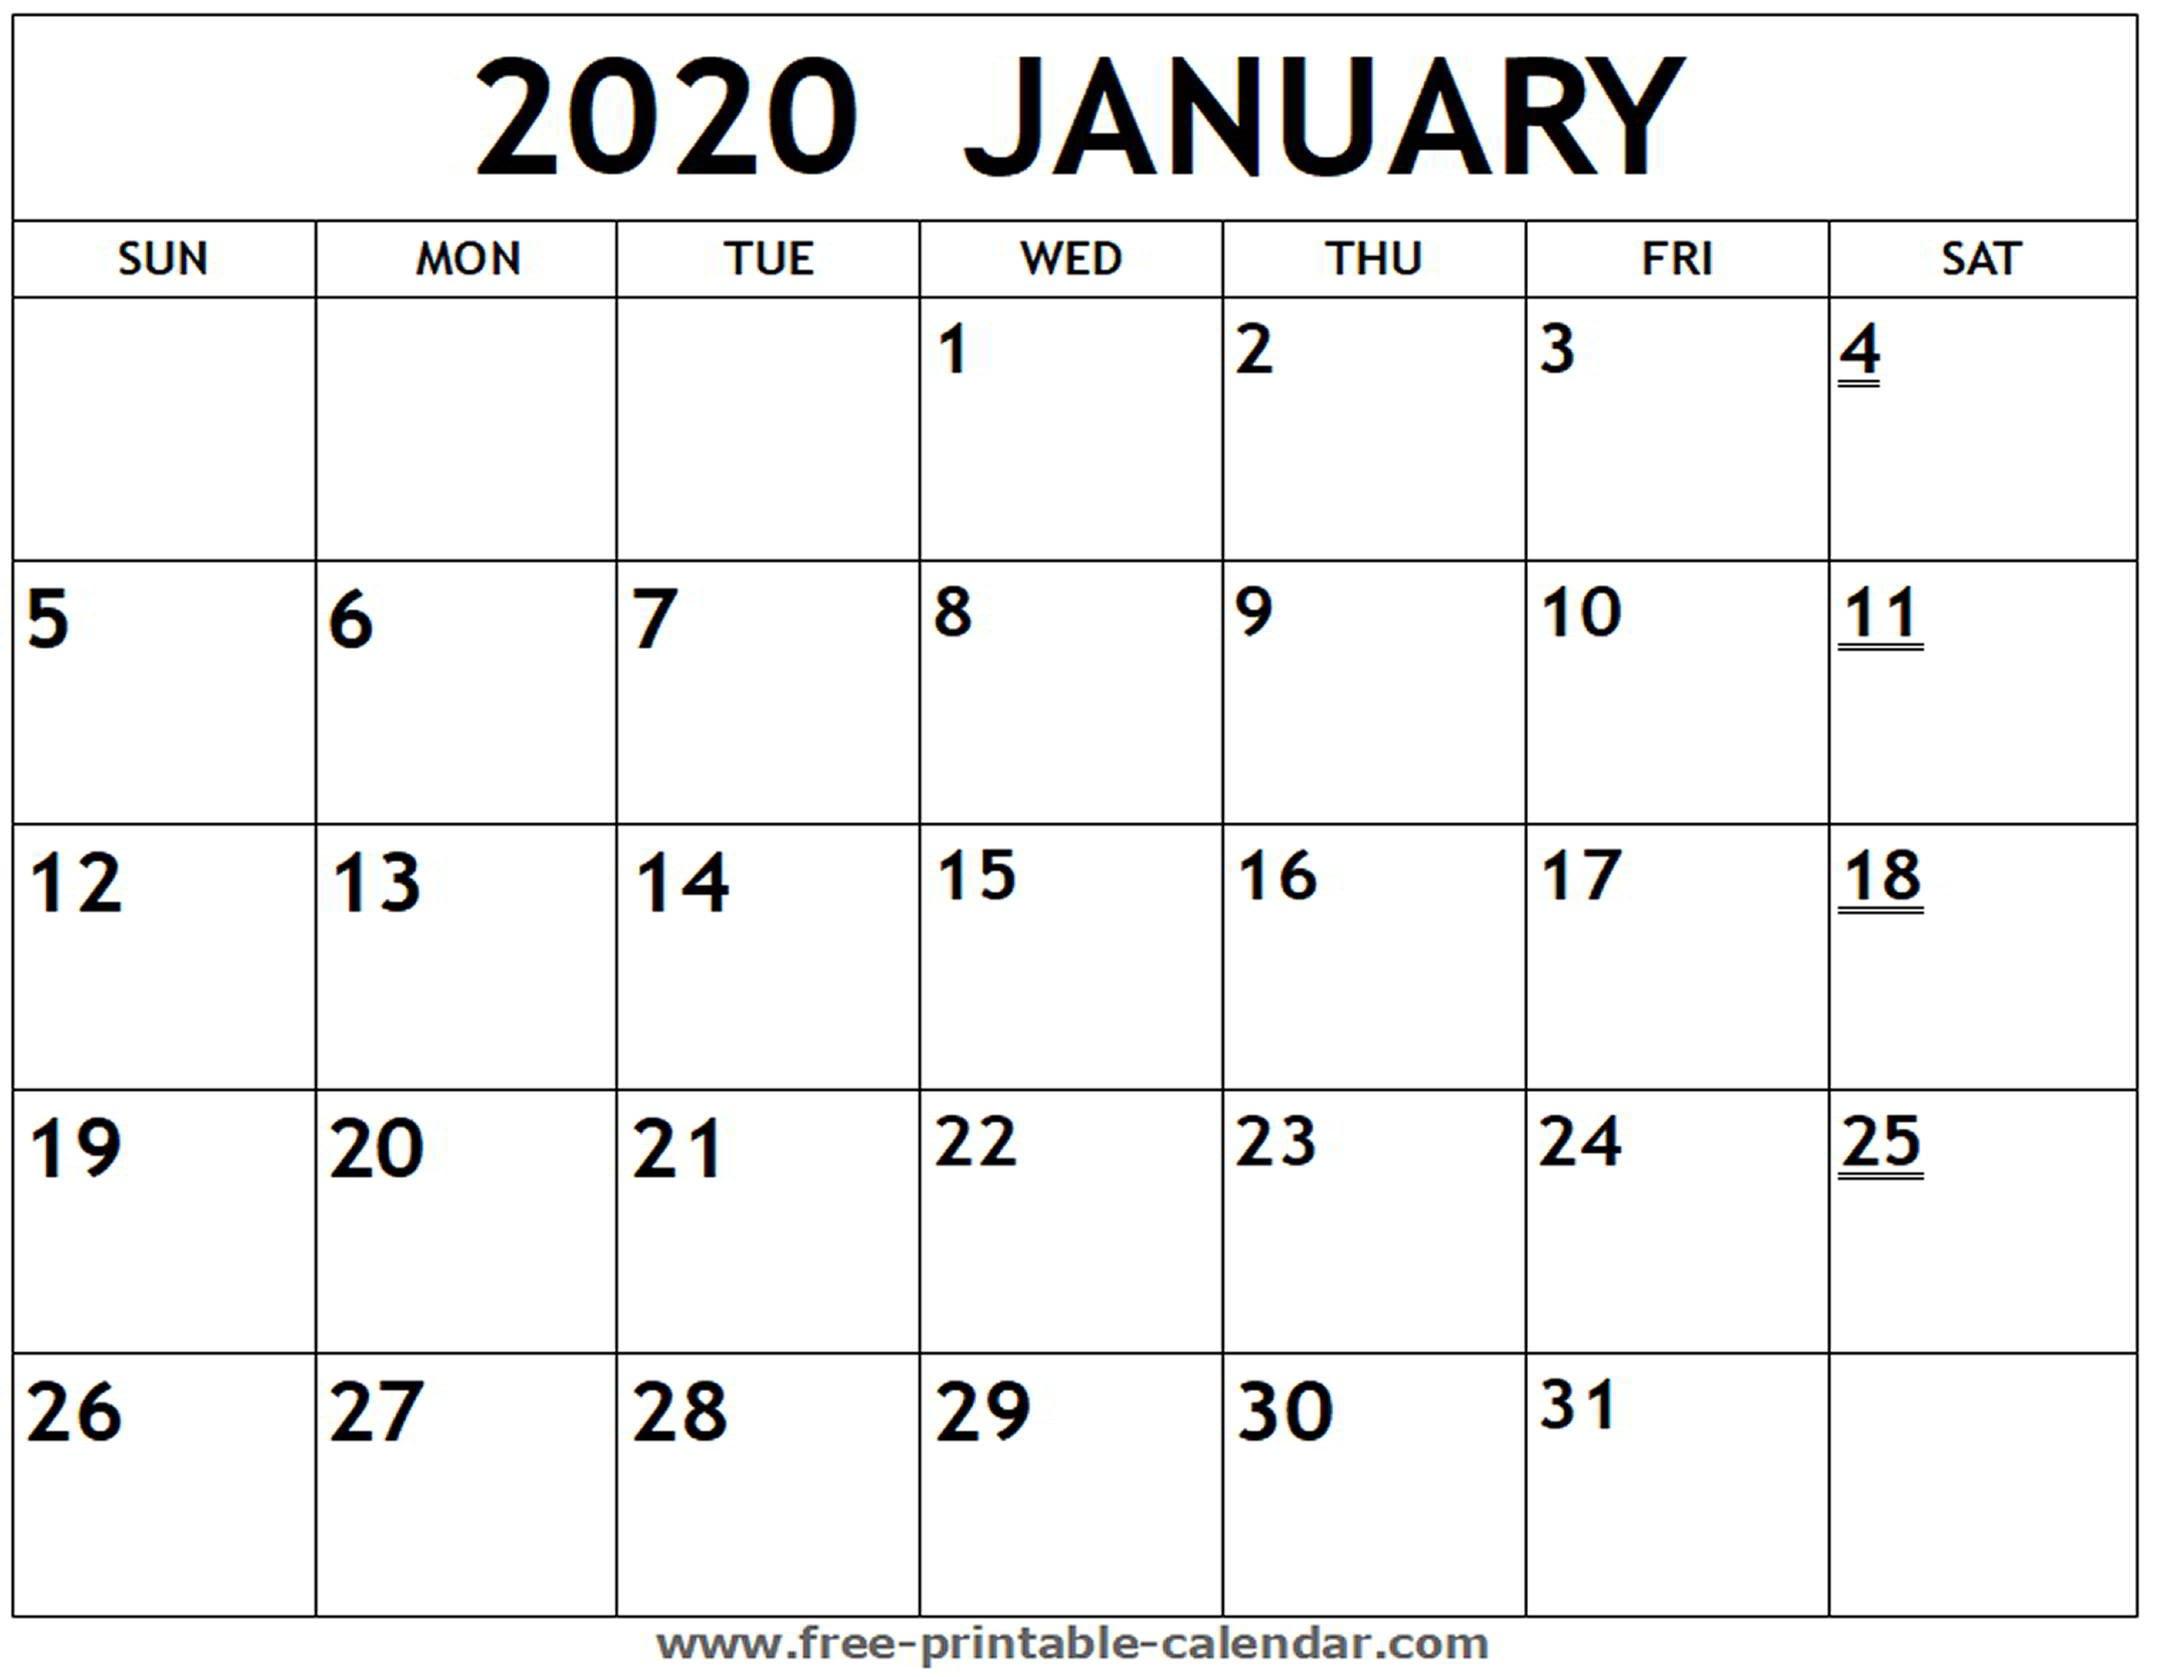 Fill In Printable Calendar 2020 Monthly | Calendar Printable Calendar Monthly Fill In